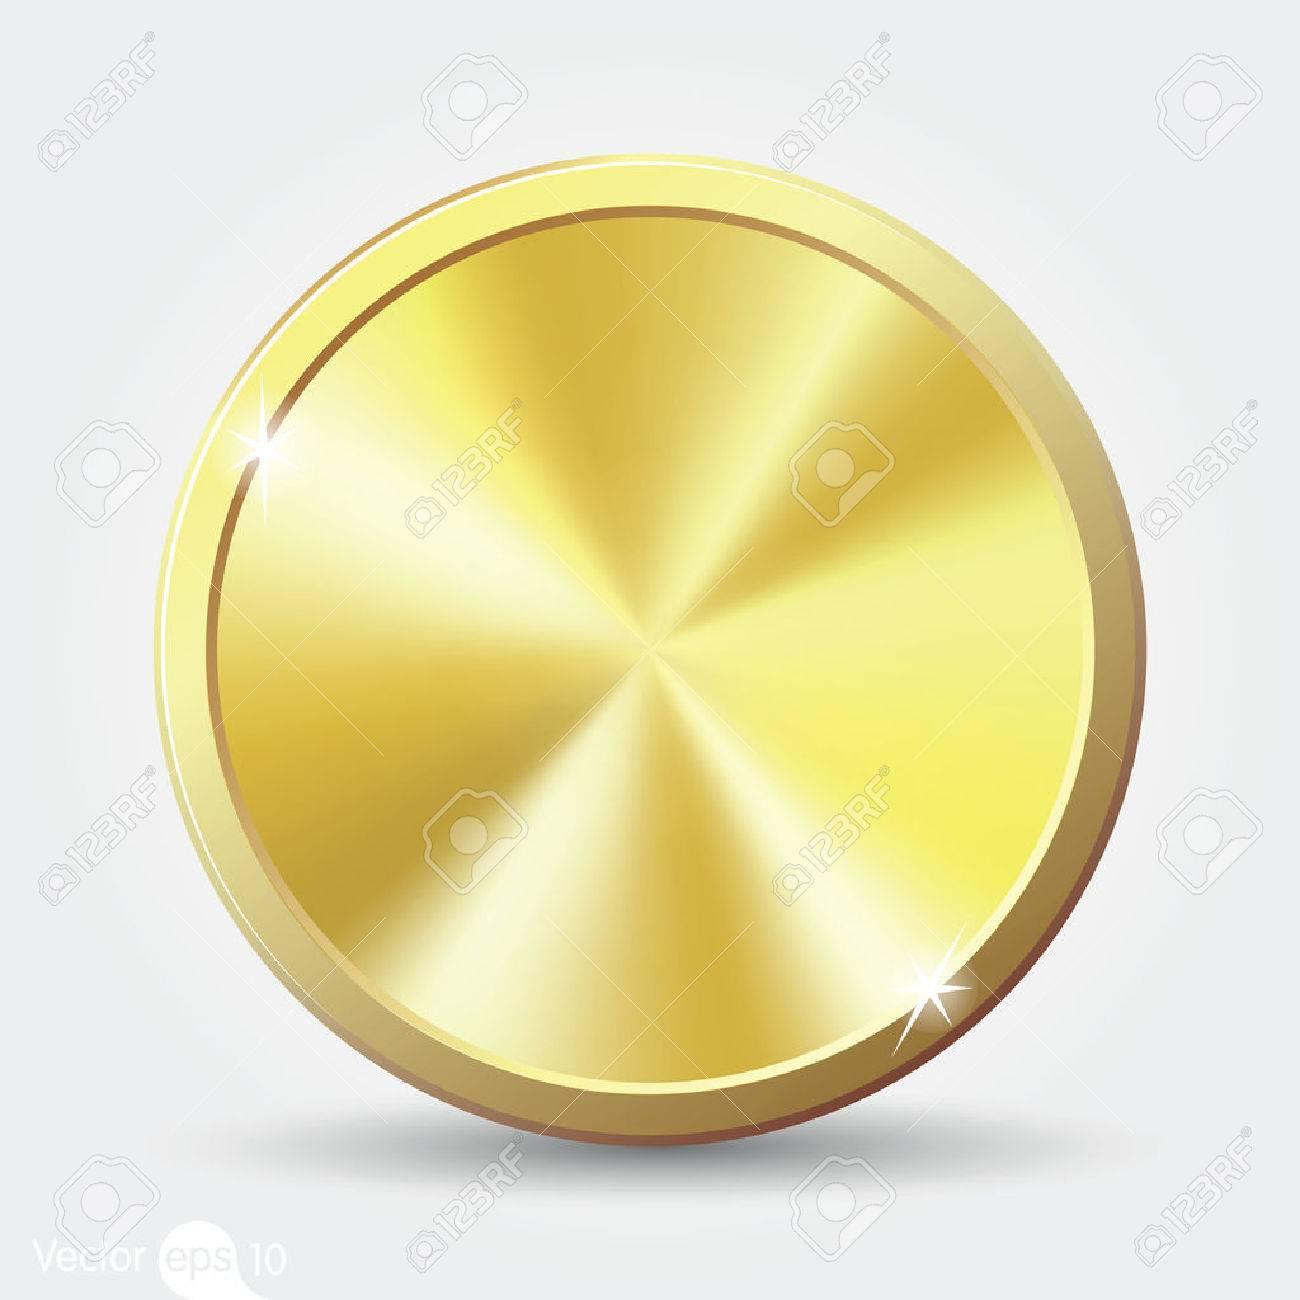 gold coin - 54831180